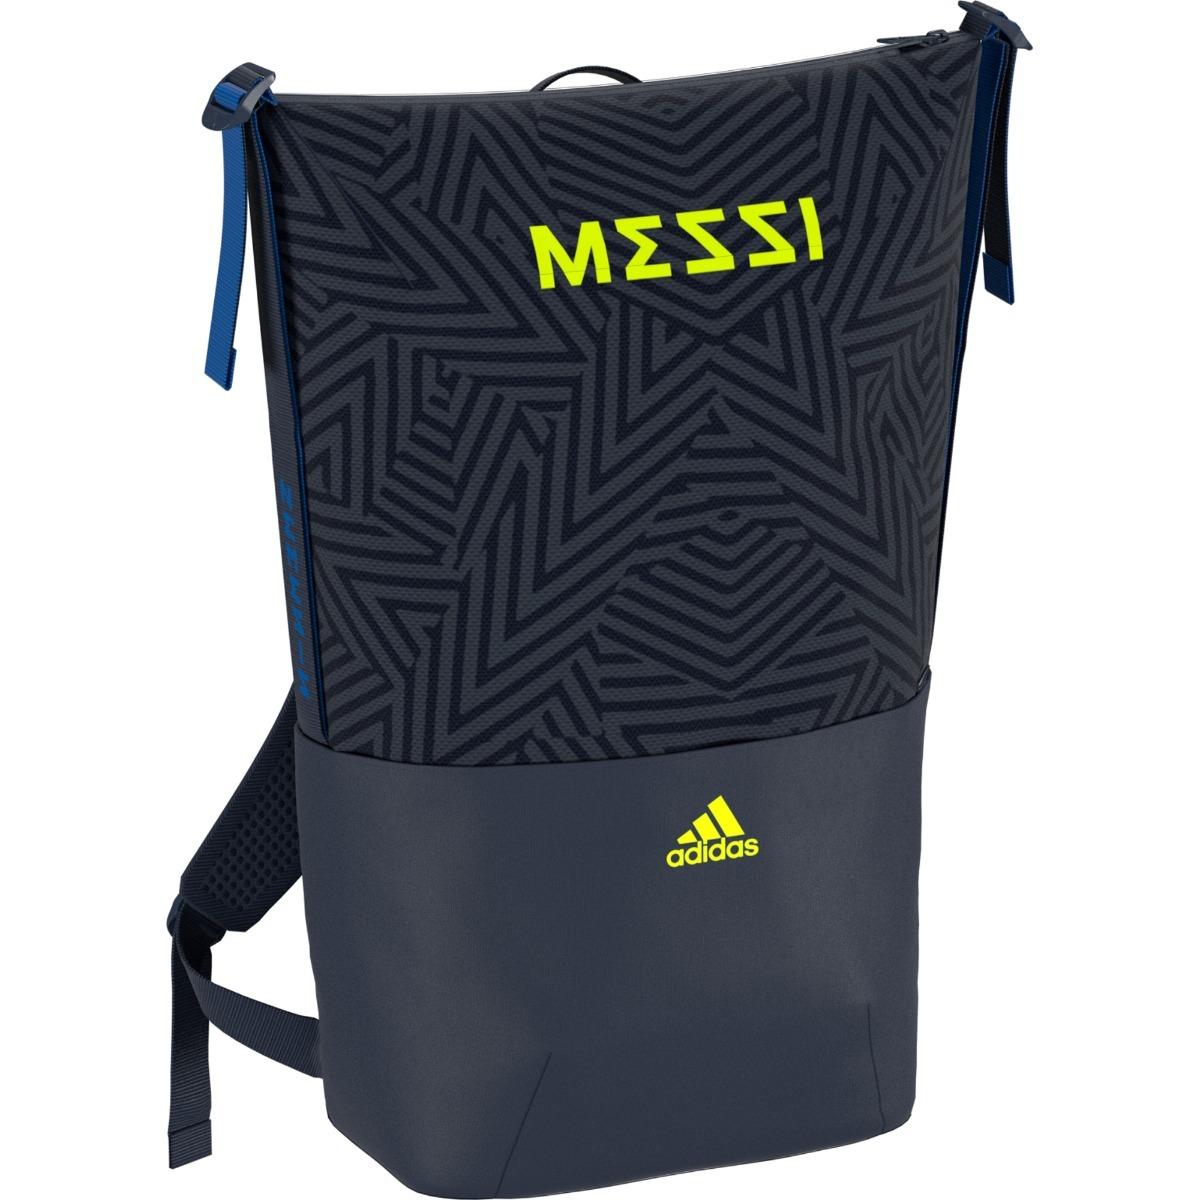 Tienda Mochila Adidas Sport Kids Team Oficial Messi kiuOXTwPZ